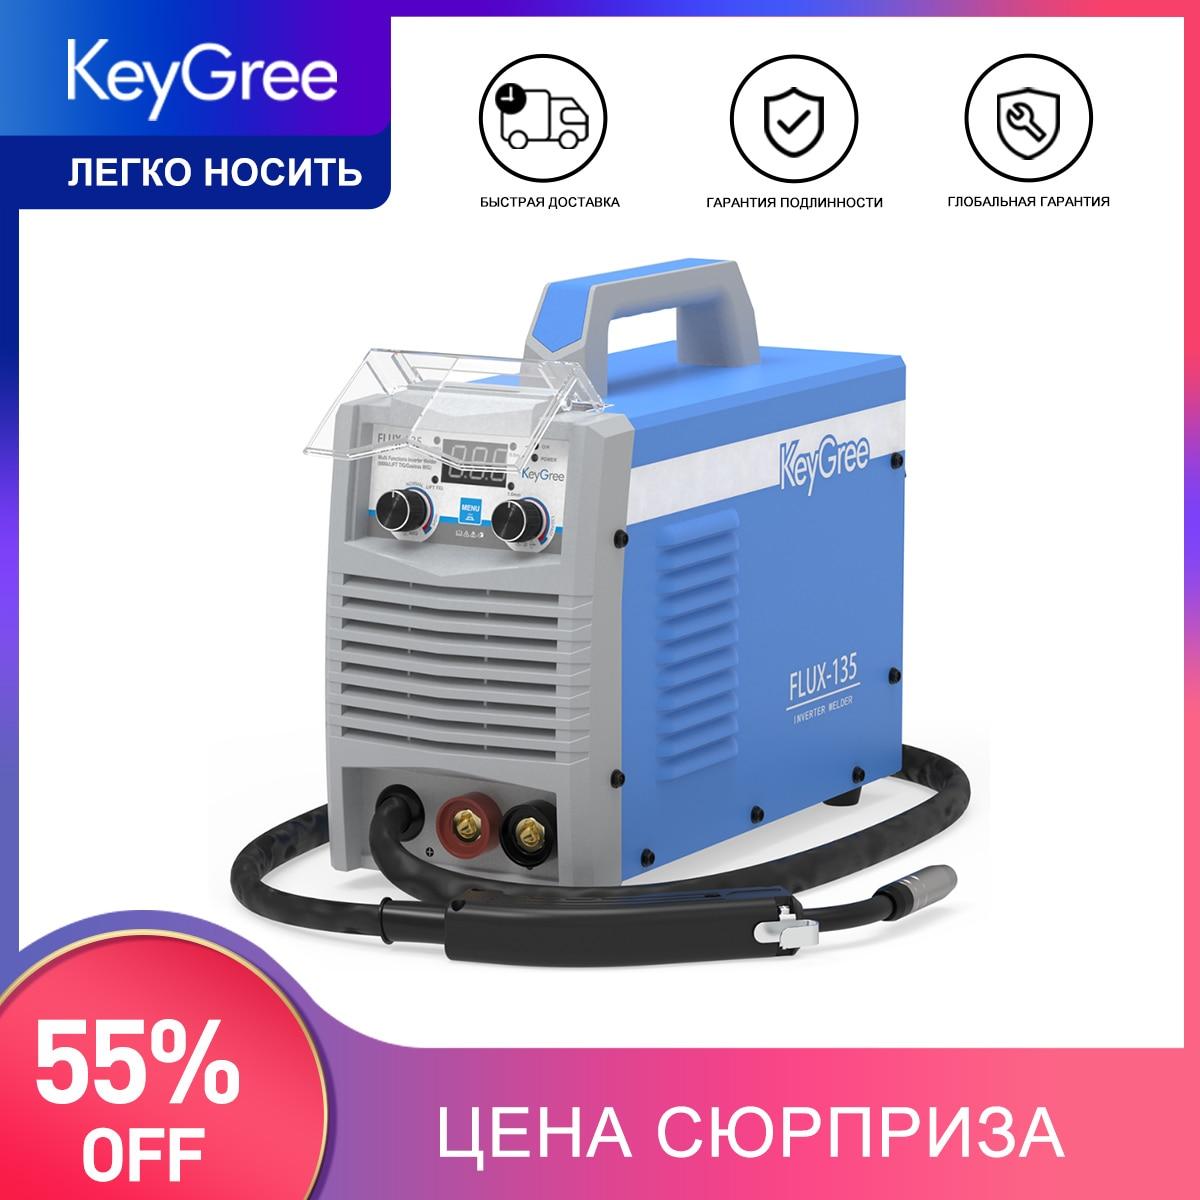 Keygree Digital Household Single Phase Flux-135 Flux Core Gasless Mig Mma Inverter Welding Machine 3 In 1 Other Arc Welders